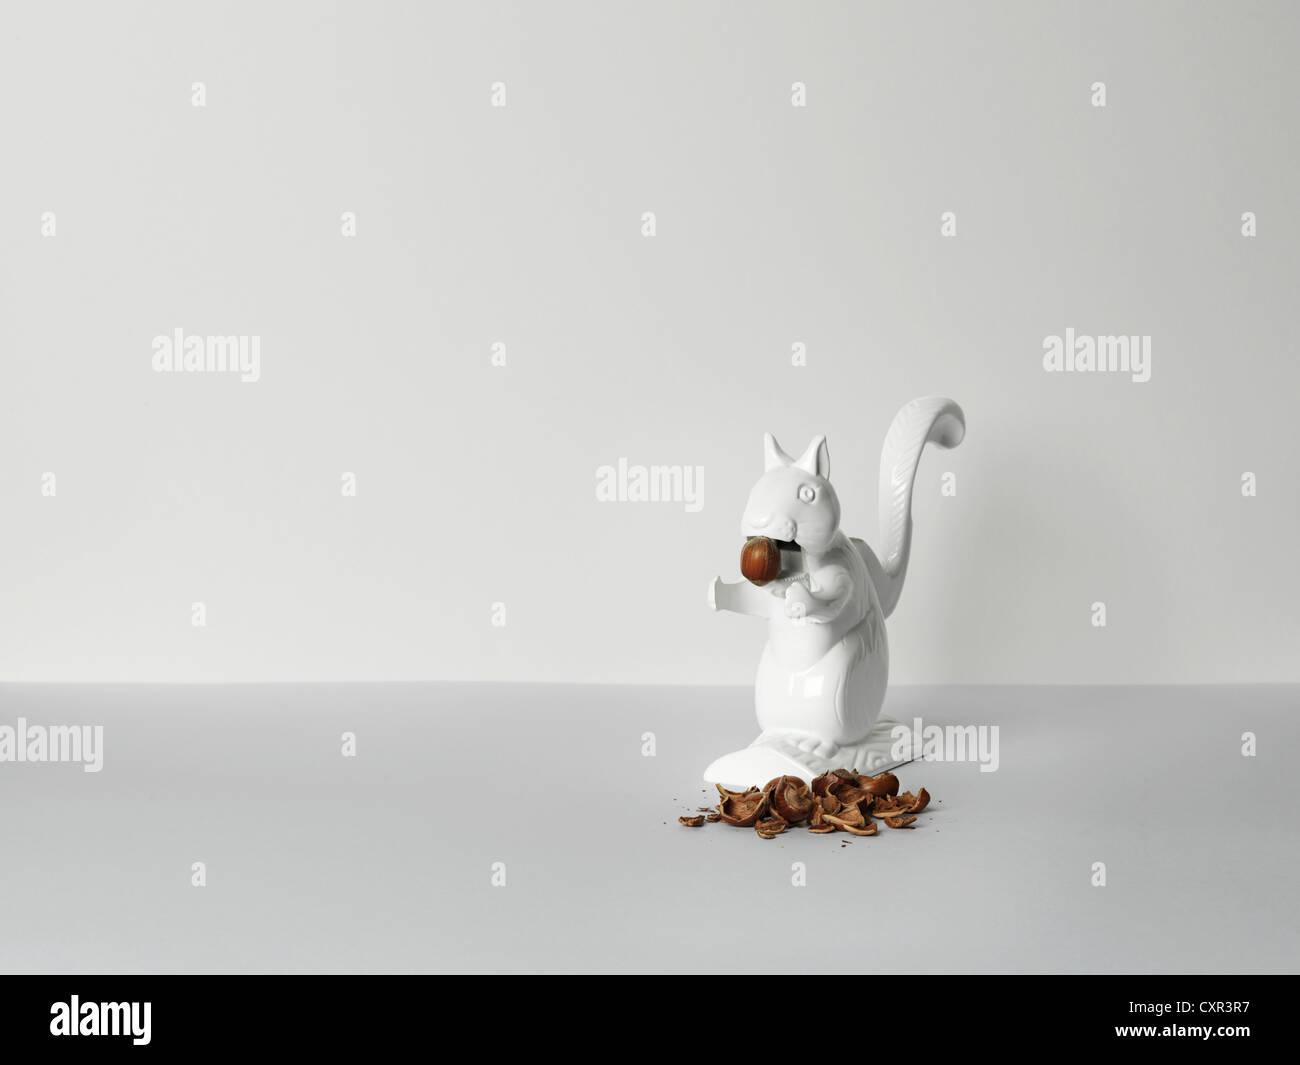 Nutcracker squirrel feeding on hazlenuts - Stock Image